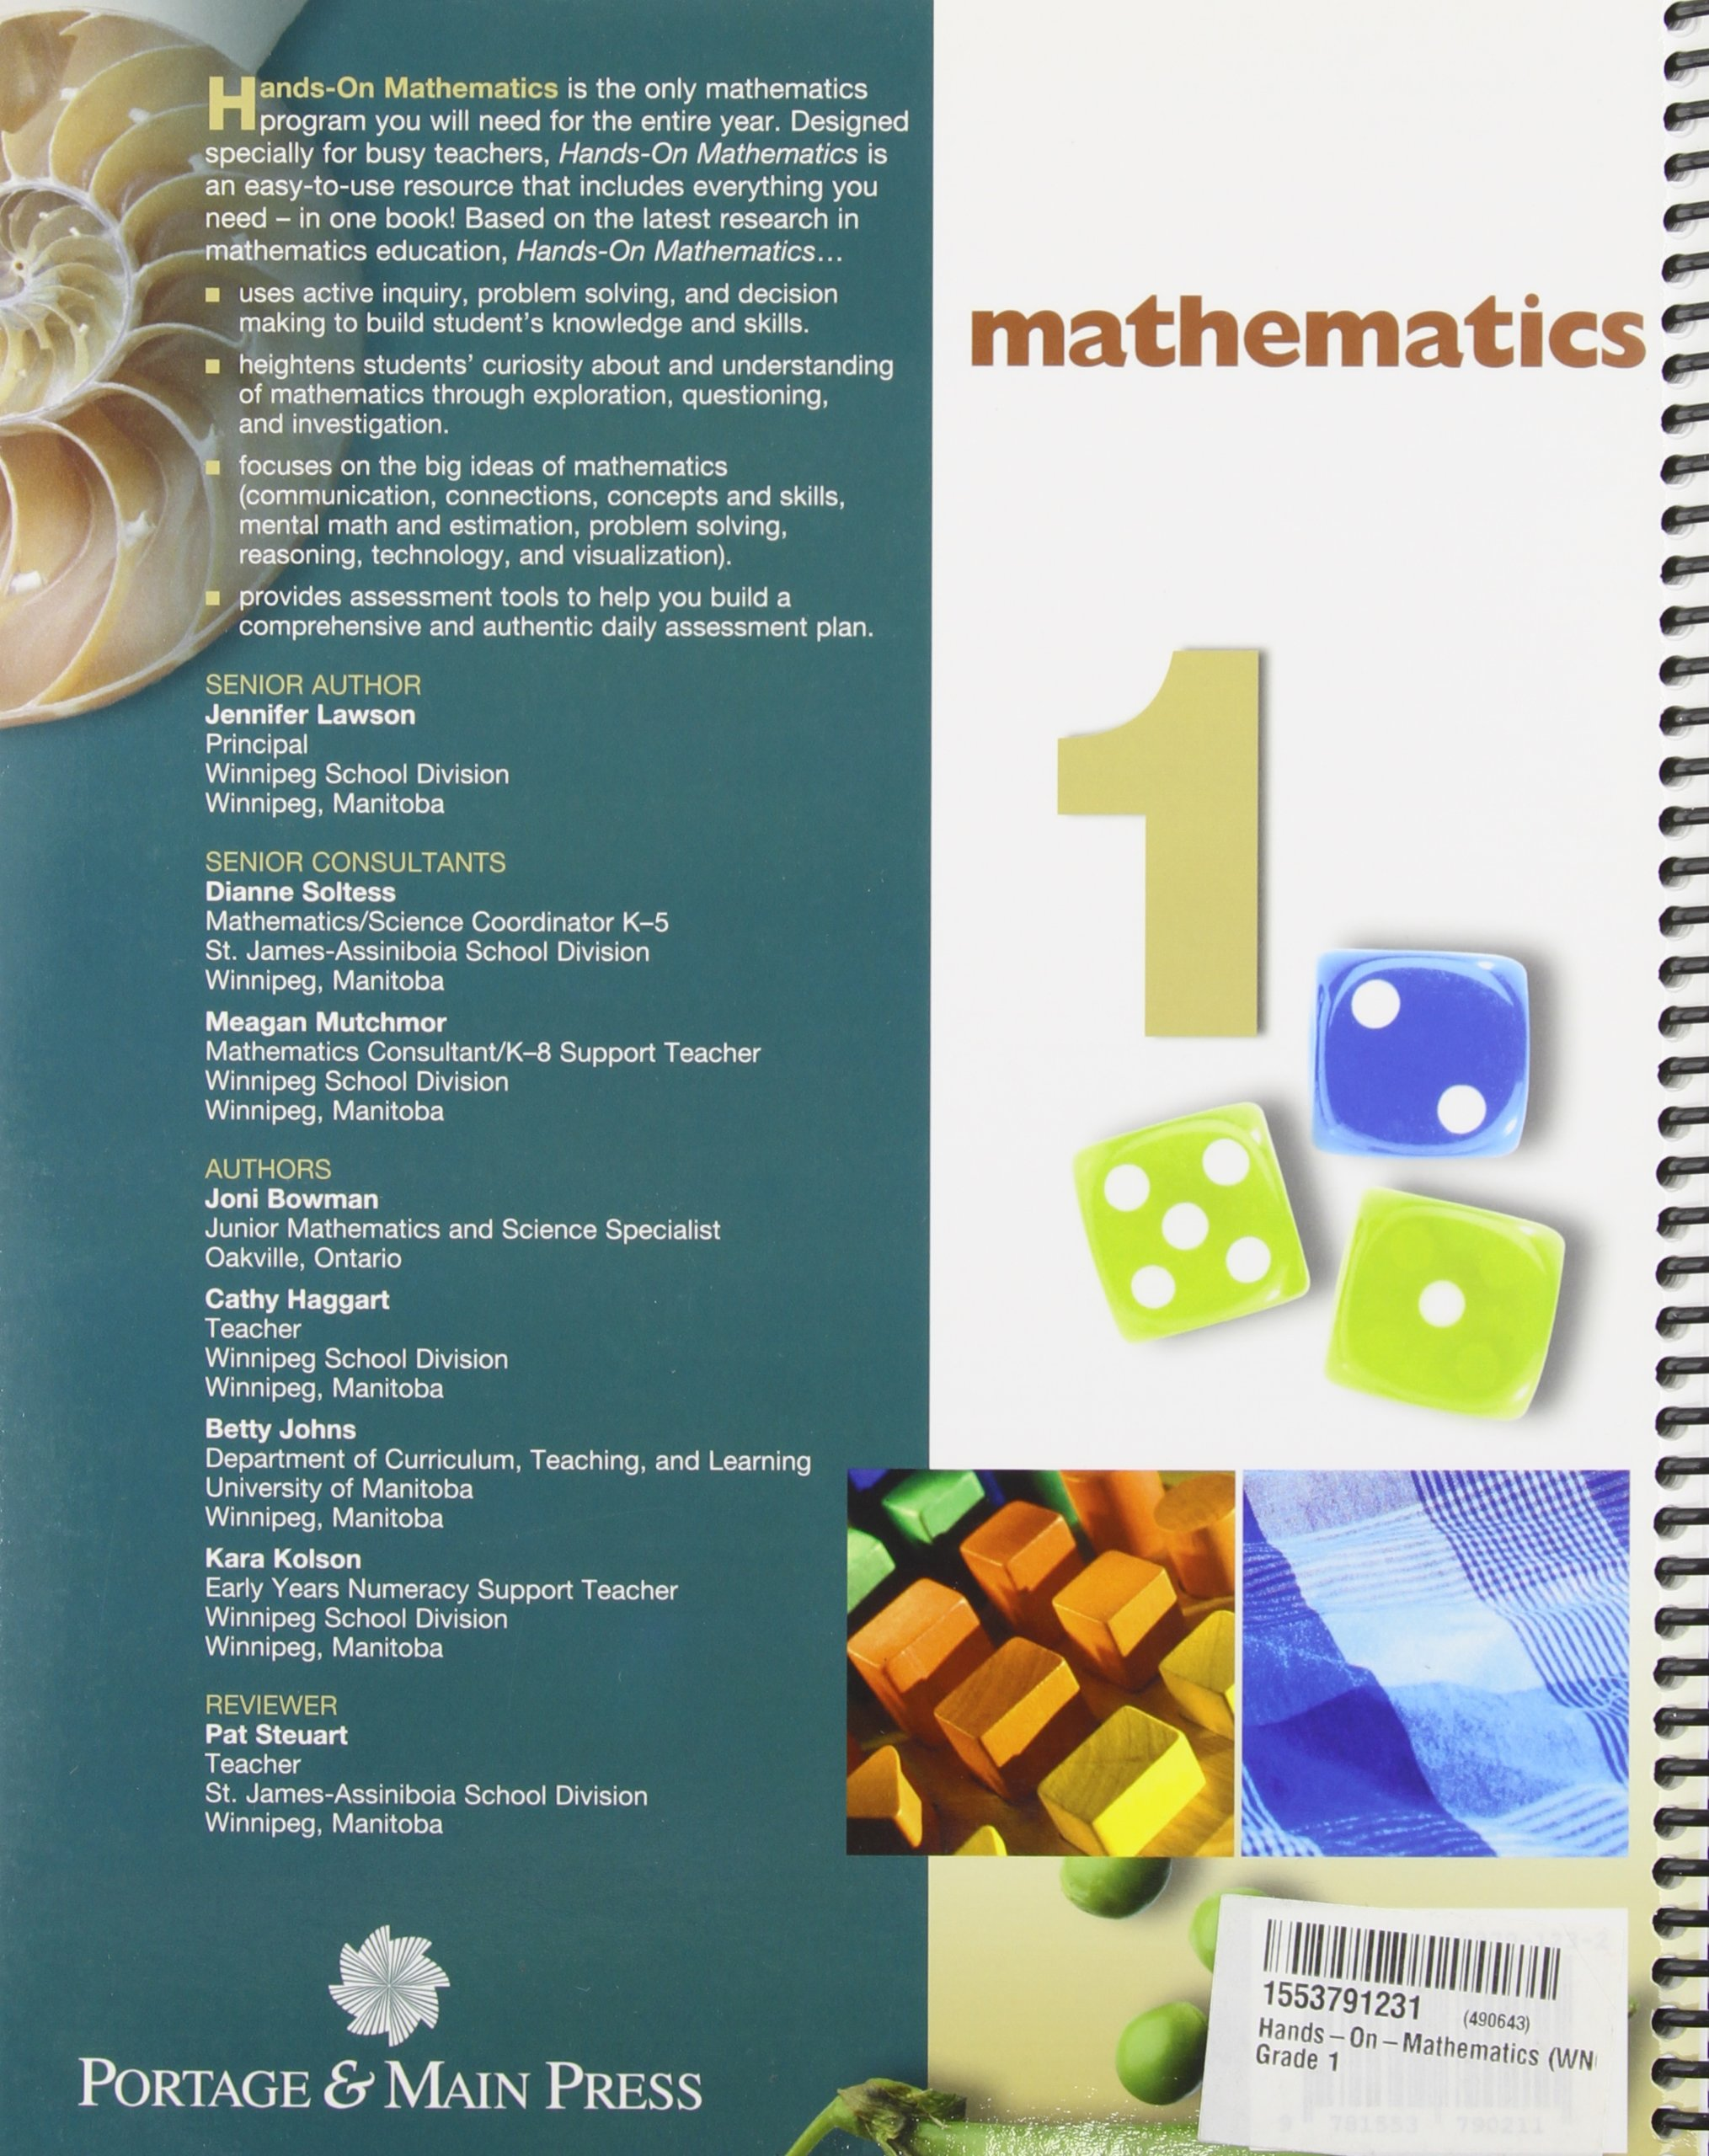 Hands-On Mathematics, Grade 1: Amazon.ca: Jennifer Lawson: Books